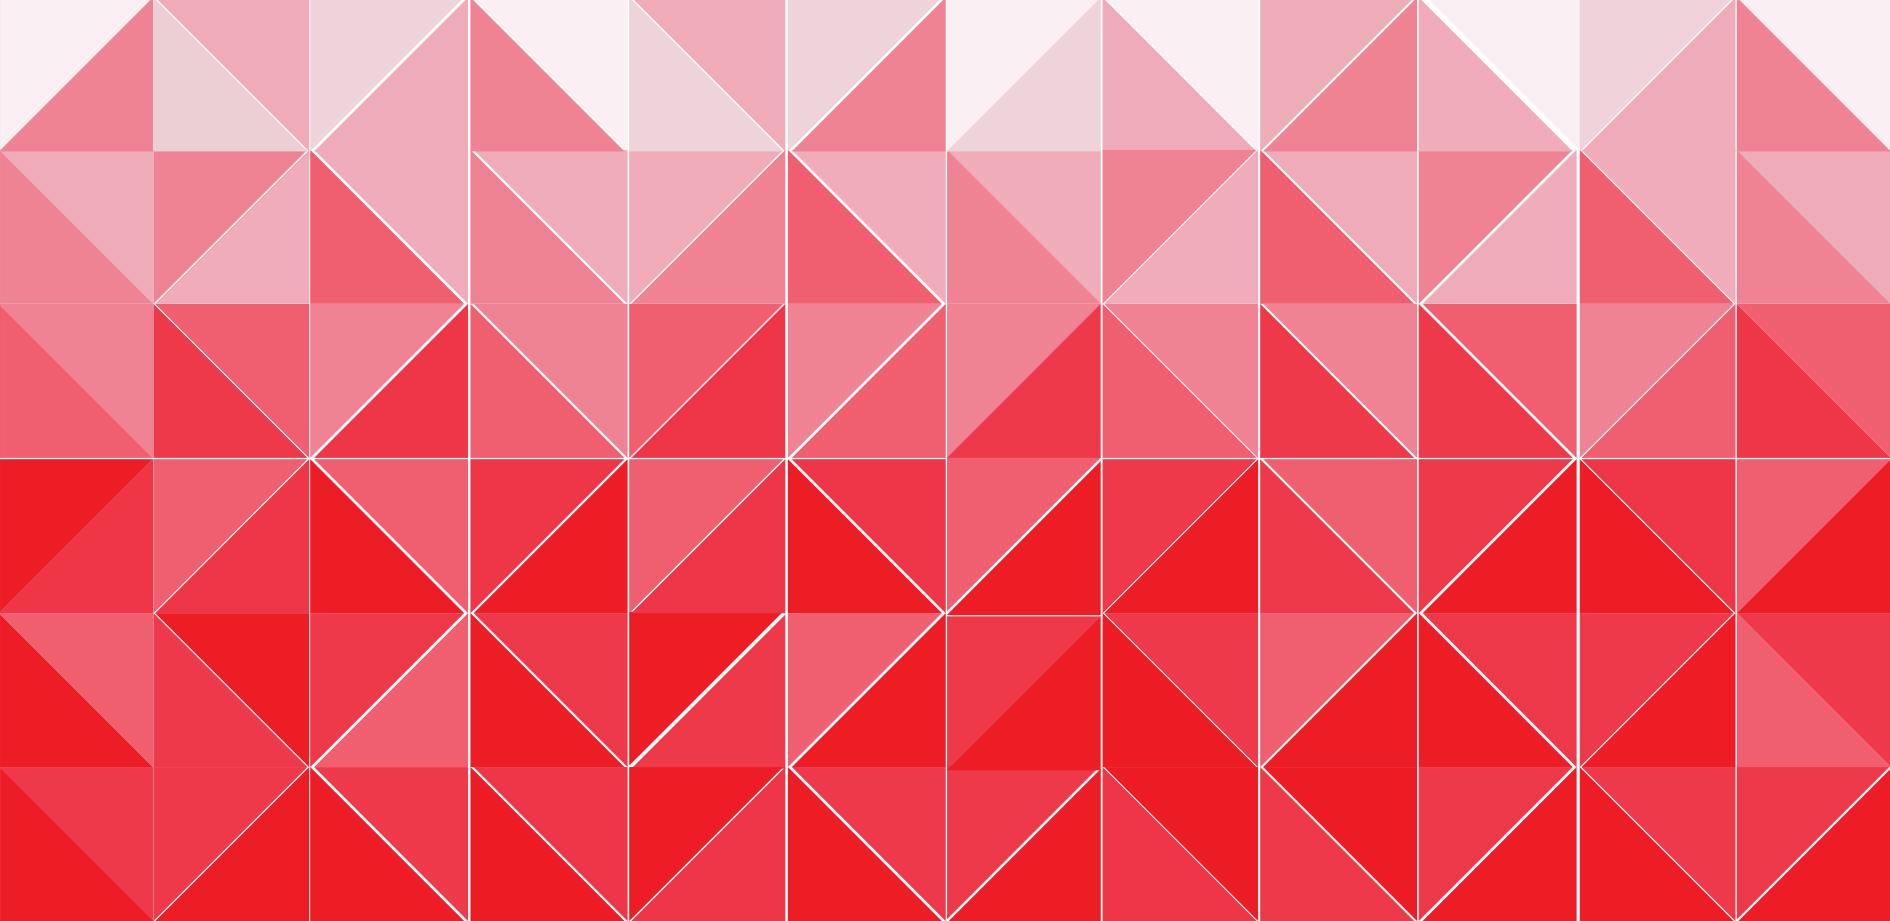 red-ombre-4.jpg#asset:16788